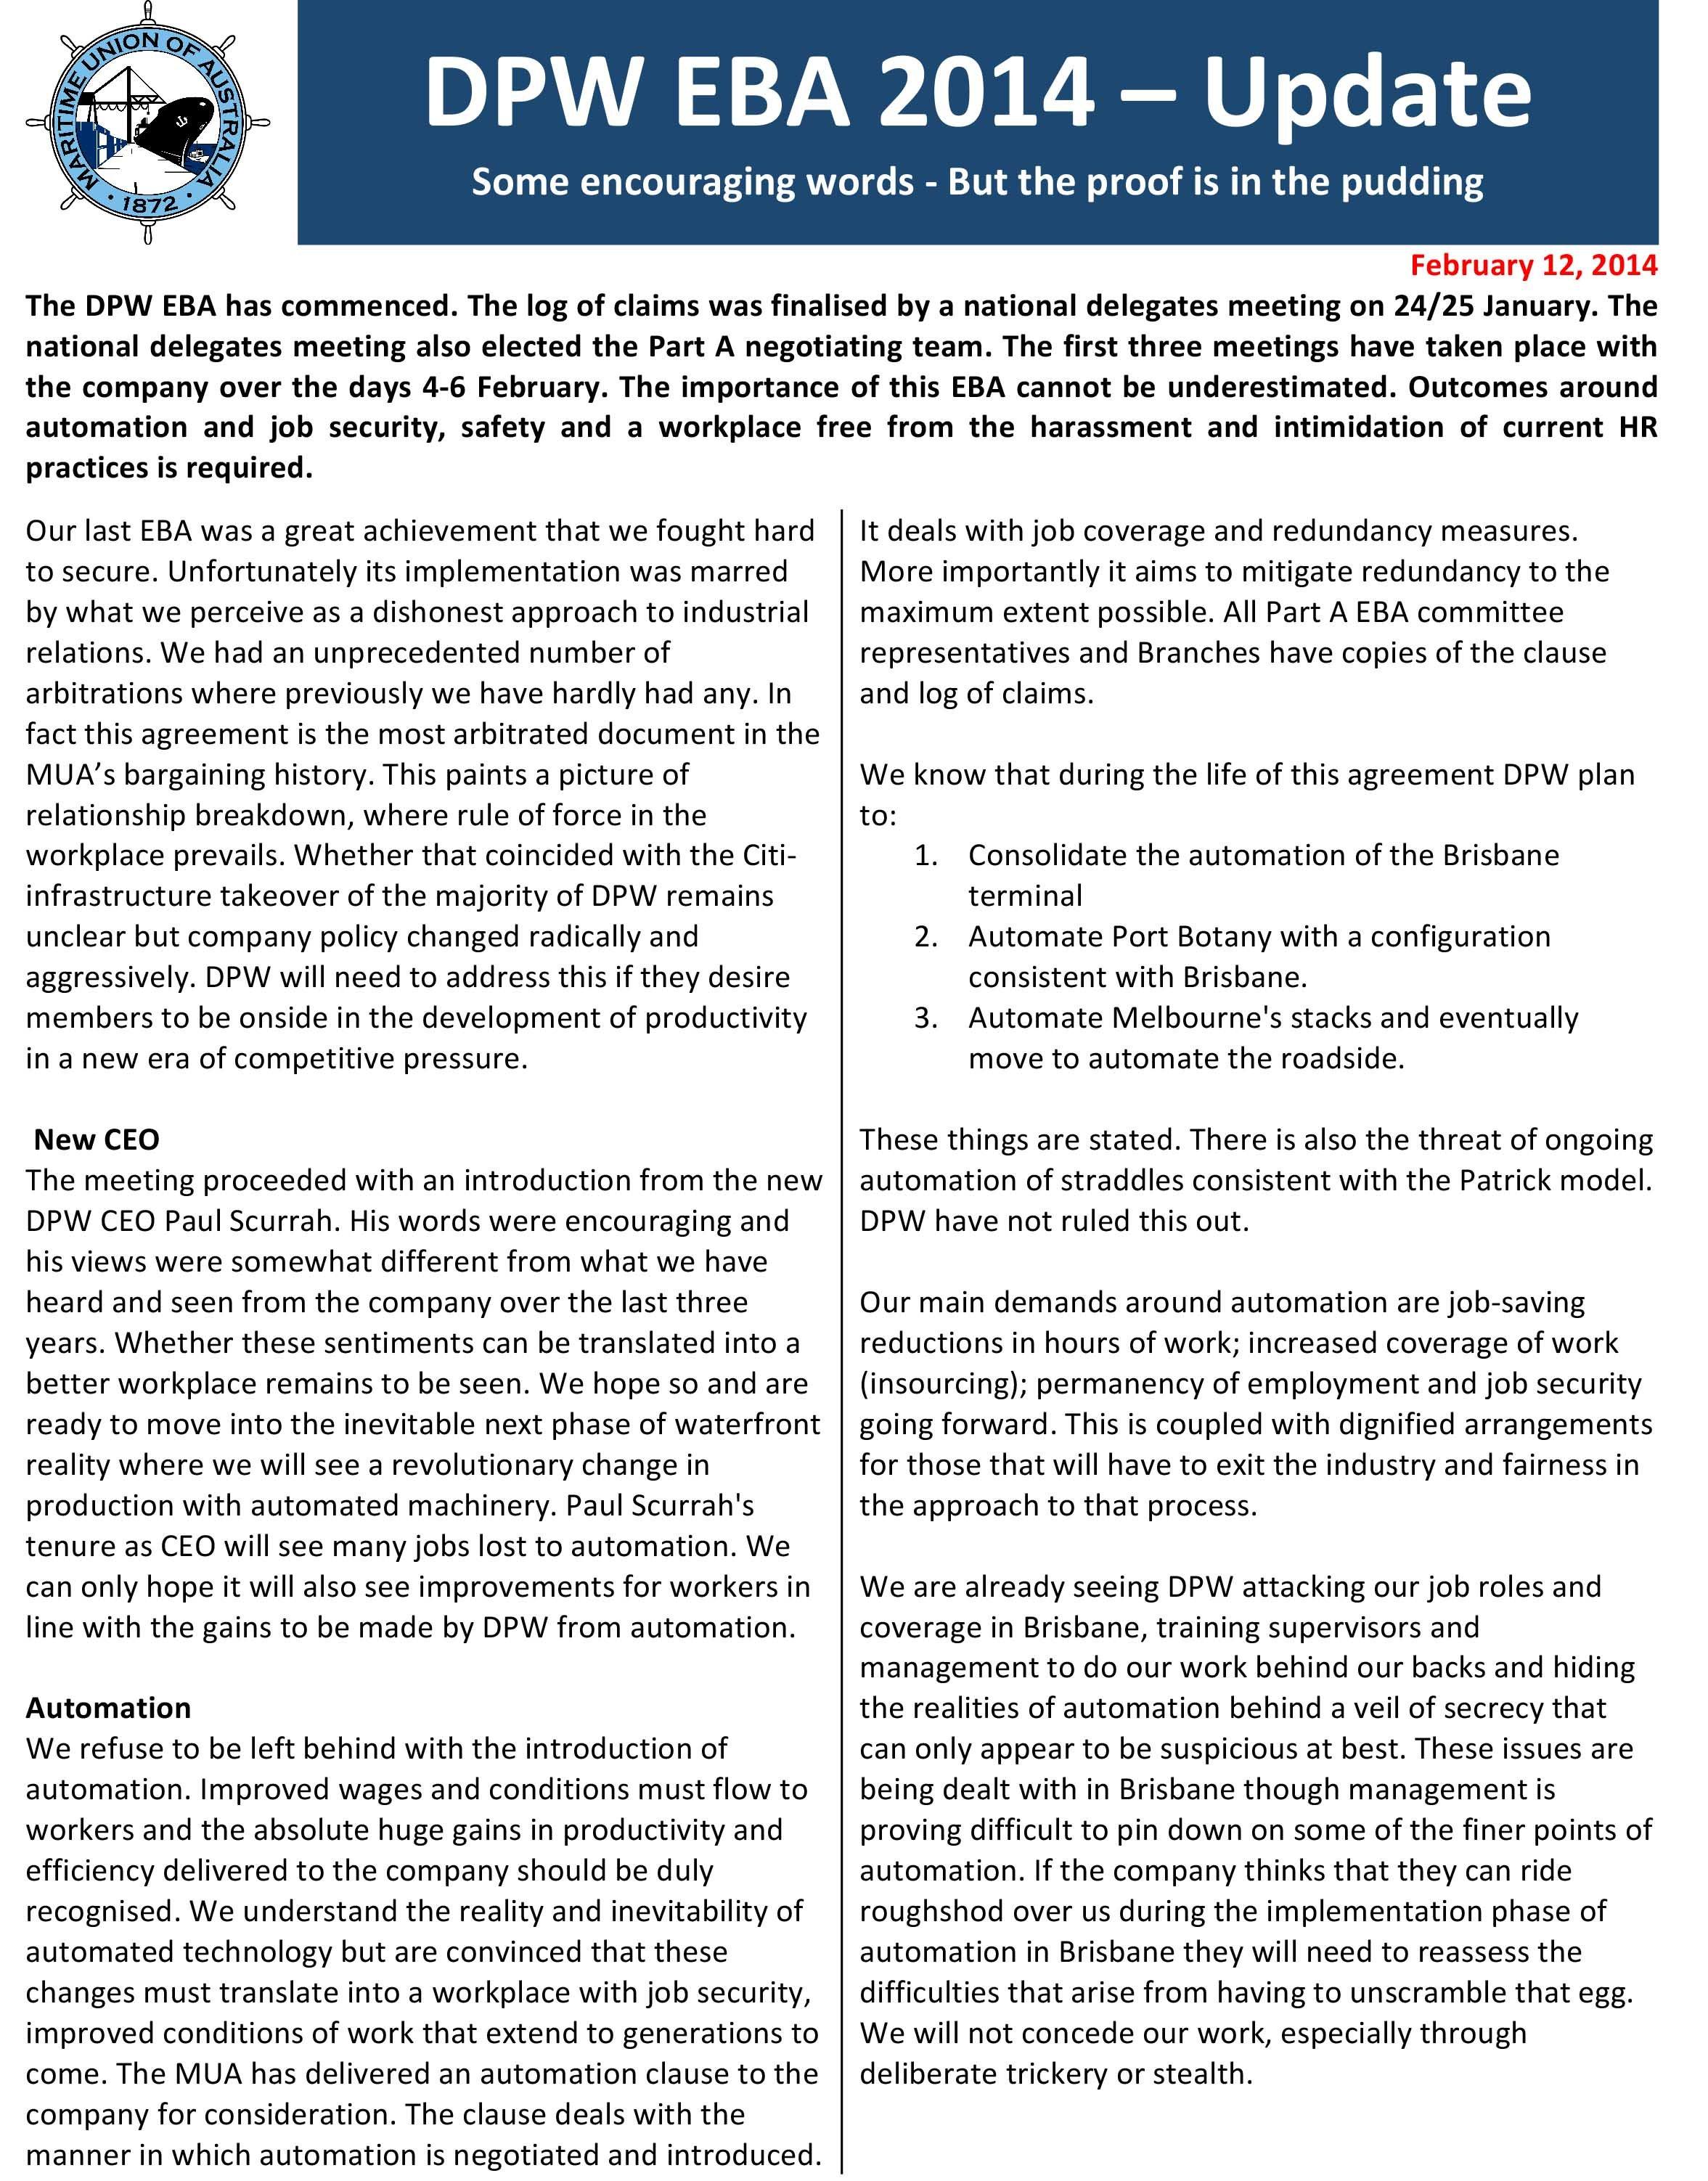 Image - DPW EBA leaflet page1.jpg